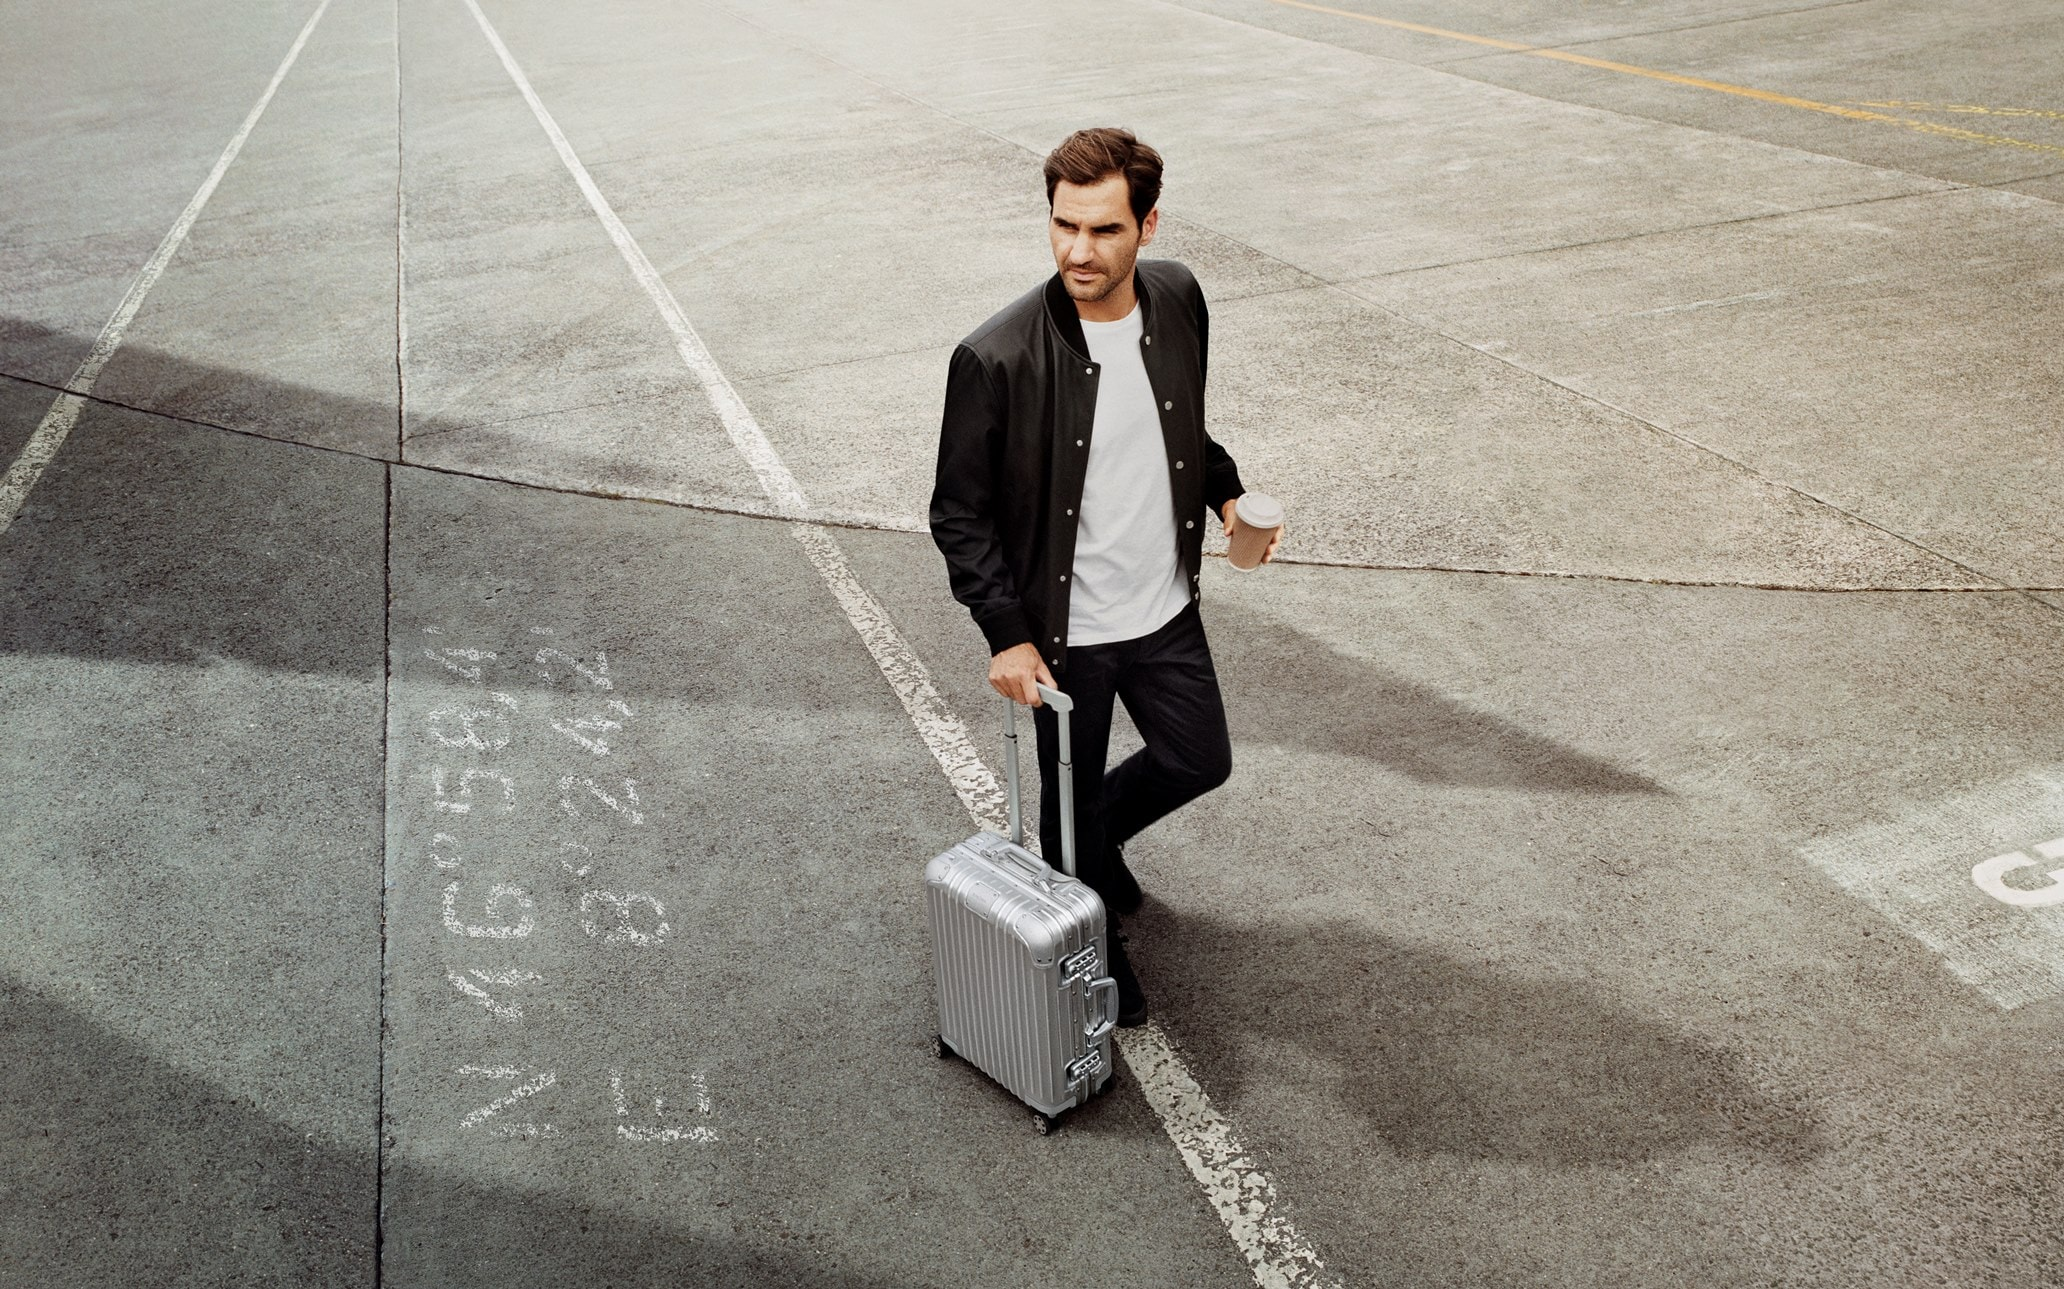 Roger Federer Leads A Cosmopolitan Cast Of World Travelers